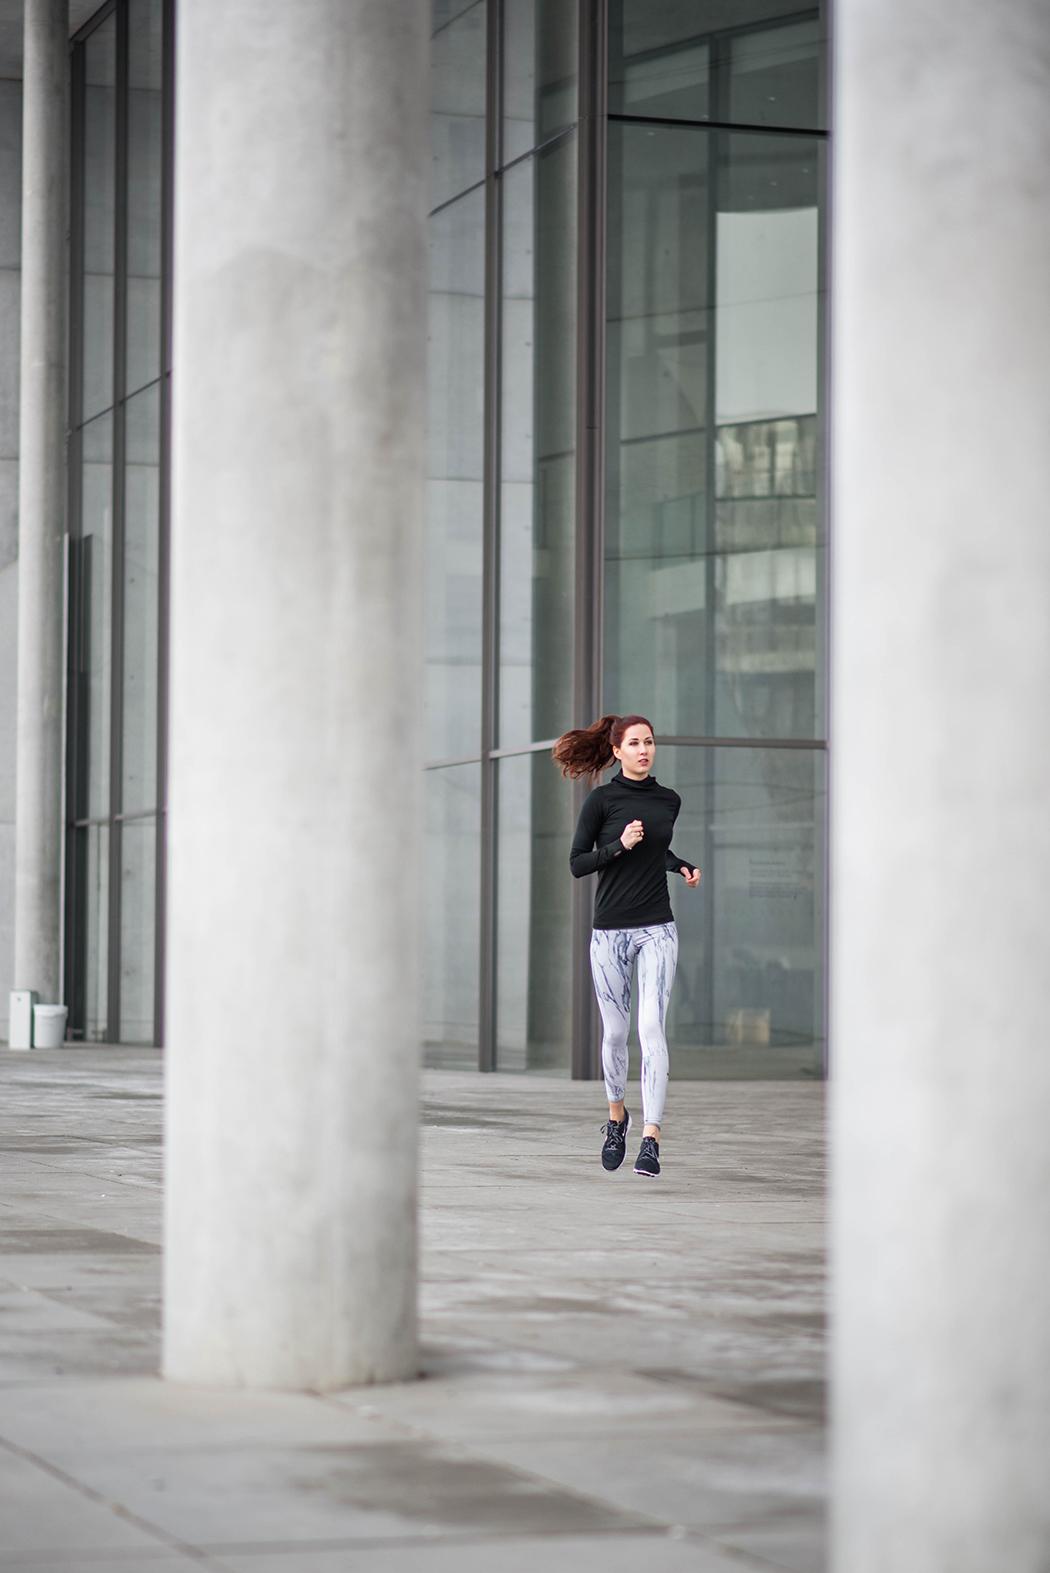 StellaMcCartney-Adidas-Fitness-Fitnessblogger-Deutschland-München-Lindarella-Sportblog-Trainingsplan-Engelhorn-1